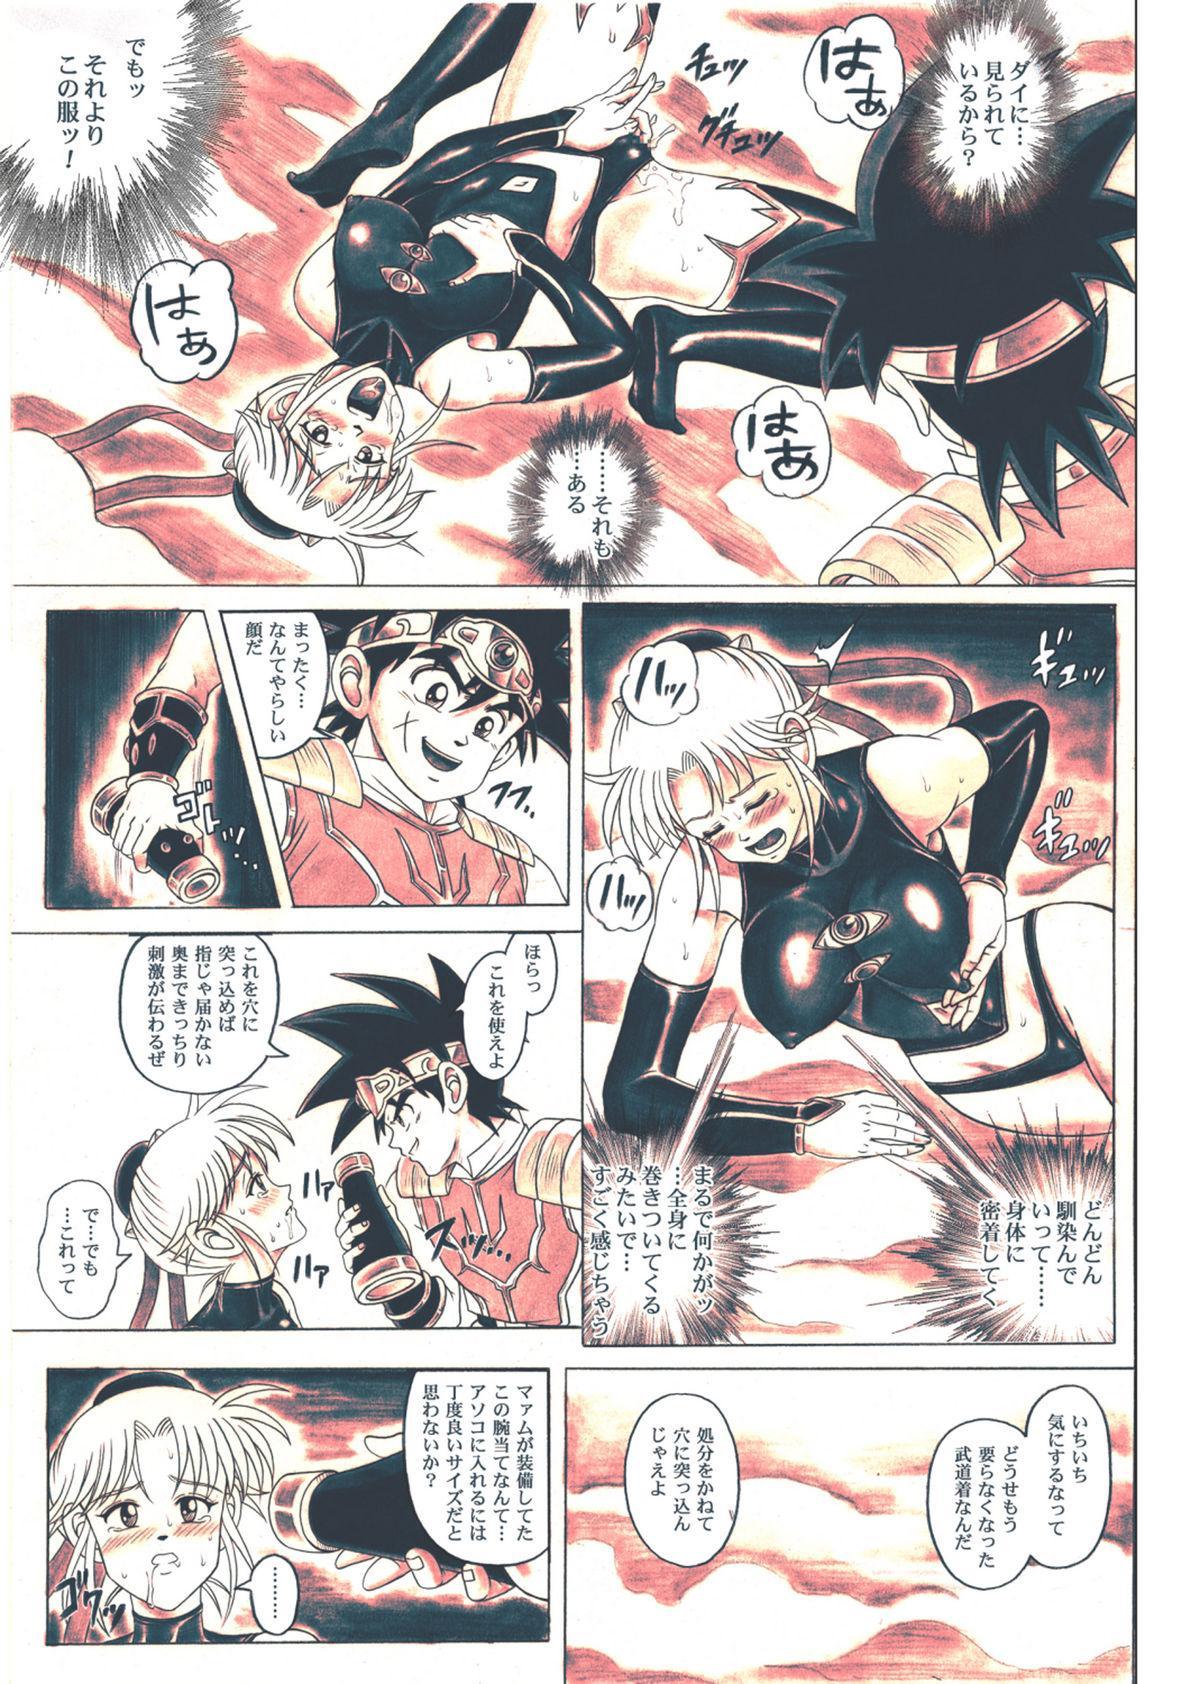 [Cyclone (Reizei, Izumi)] STAR TAC IDO ~Youkuso Haja no Doukutsu he~ Chuuhen Download edition (Dragon Warrior: Dai's Great Adventure) [Digital] 130